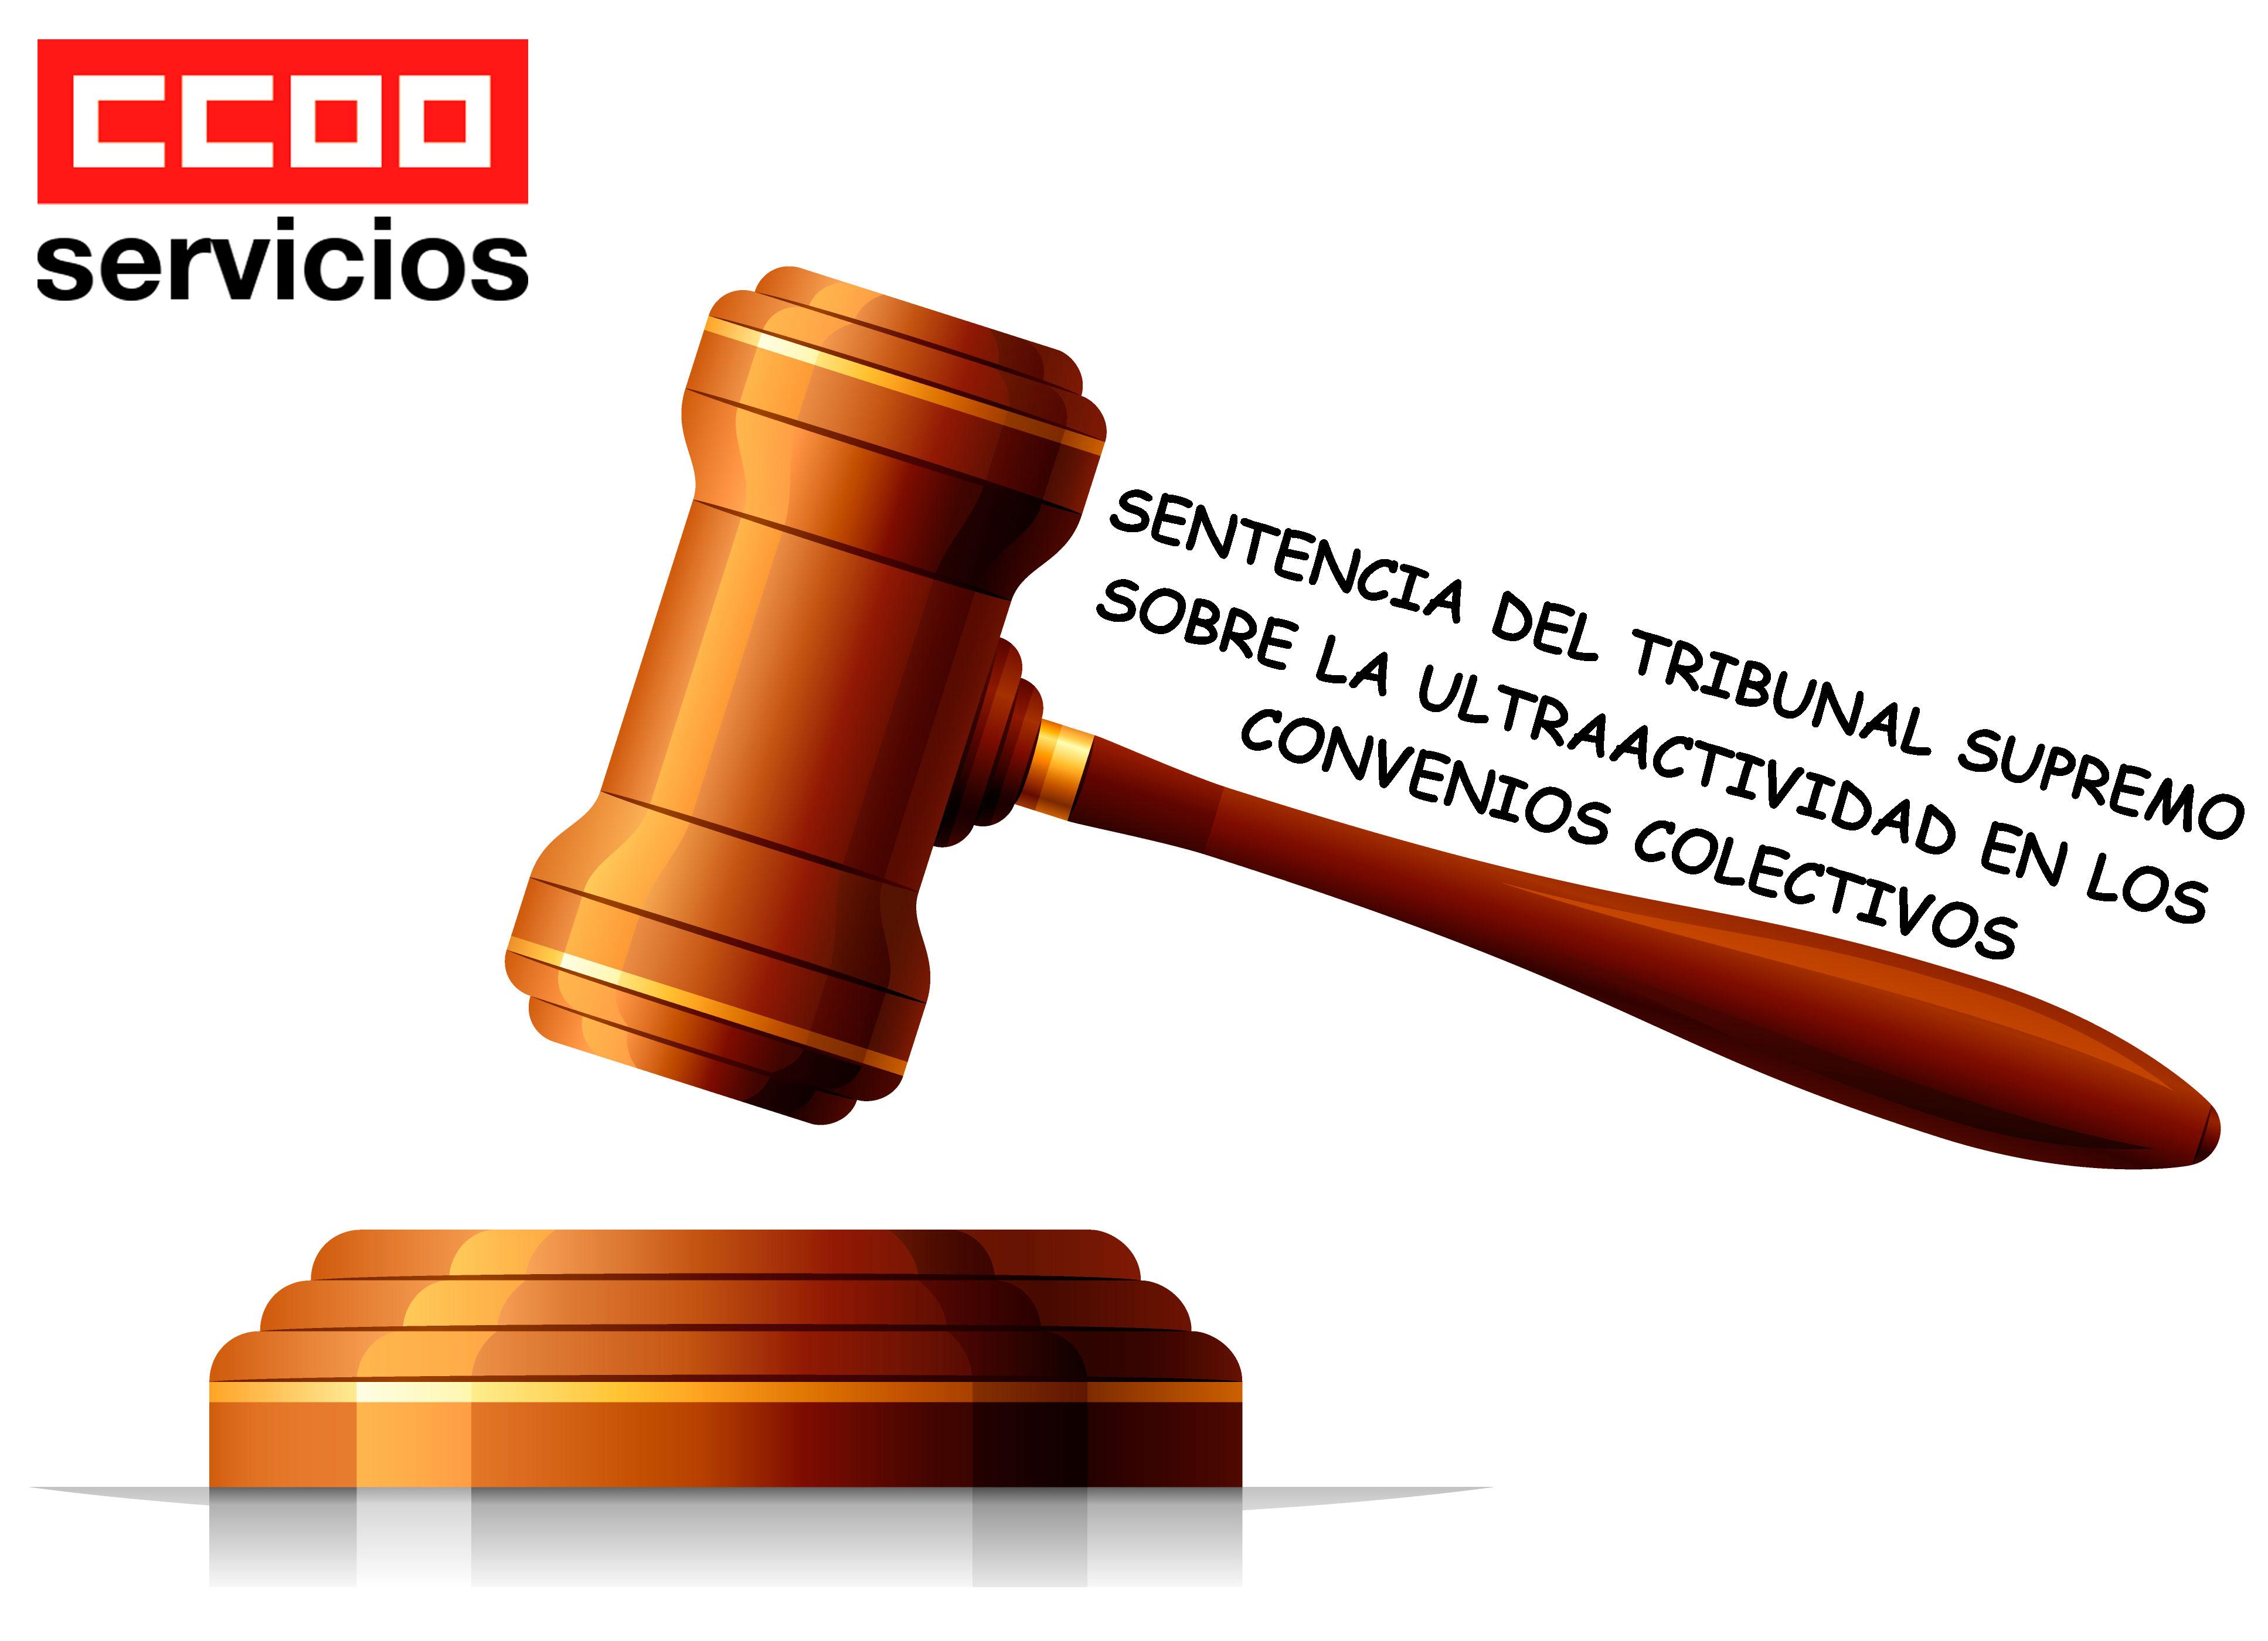 https://sites.google.com/site/ssccoosogeti/comunicados/hemeroteca-comunicados/comunicados-2015/2015-05-11comunicado43convenioticsentenciadeltribunalsupremosobrelaultraactividadenlosconvenioscolectivosestatal